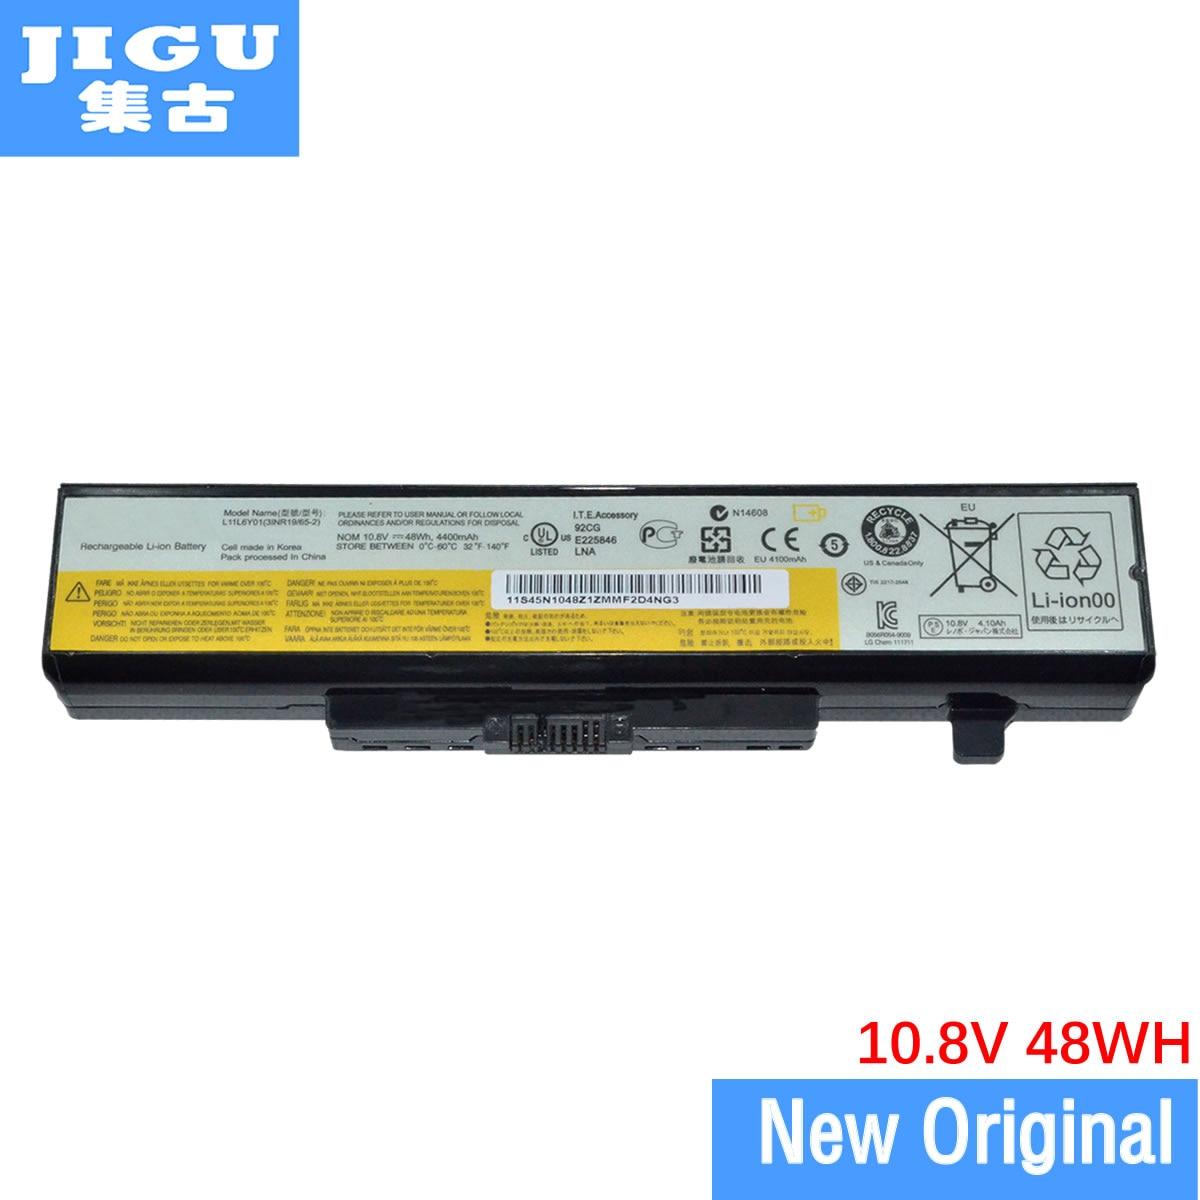 Оригинальный аккумулятор JIGU для lenovo IdeaPad G400 G405 G410 G480 G485 G500 G505 G510 G580 G700 G710 Y480 Y485 Y580 P N